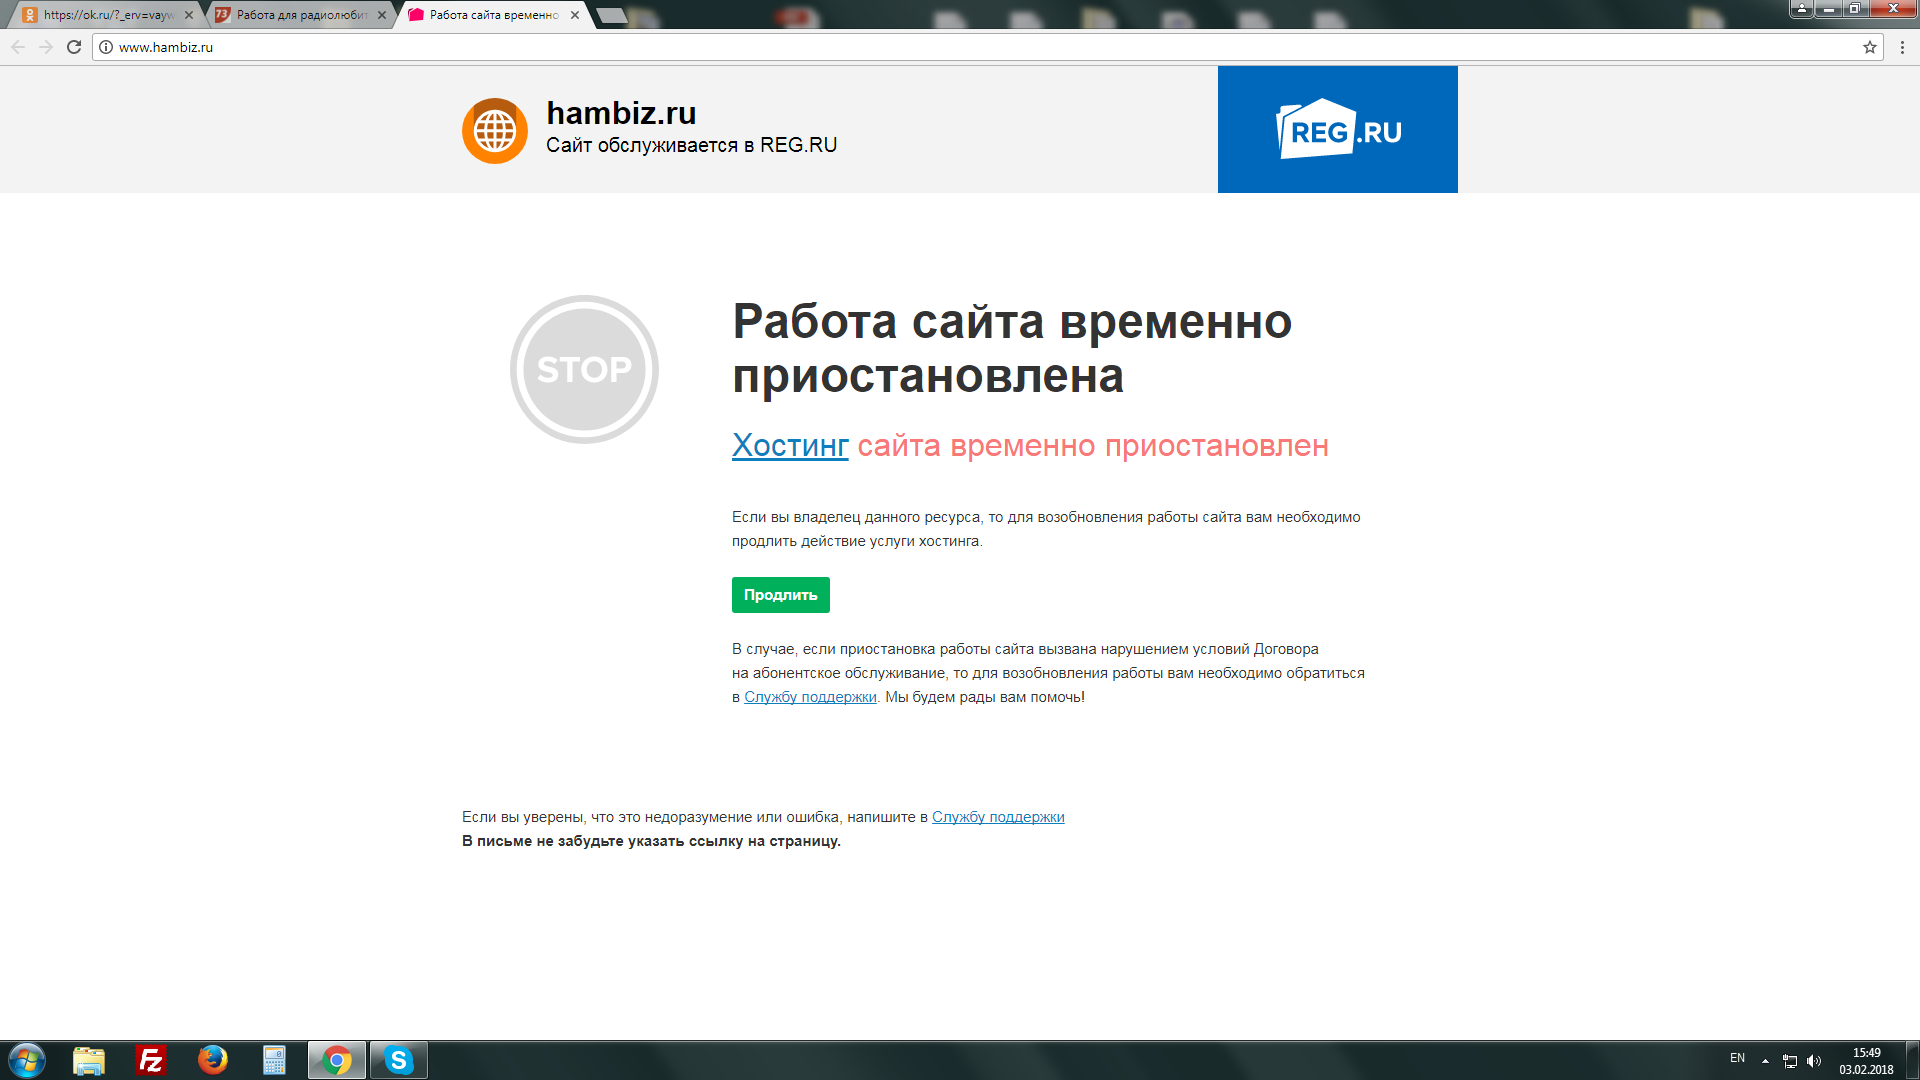 Нажмите на изображение для увеличения.  Название:hambiz_konchilsya.png Просмотров:14 Размер:136.4 Кб ID:205508